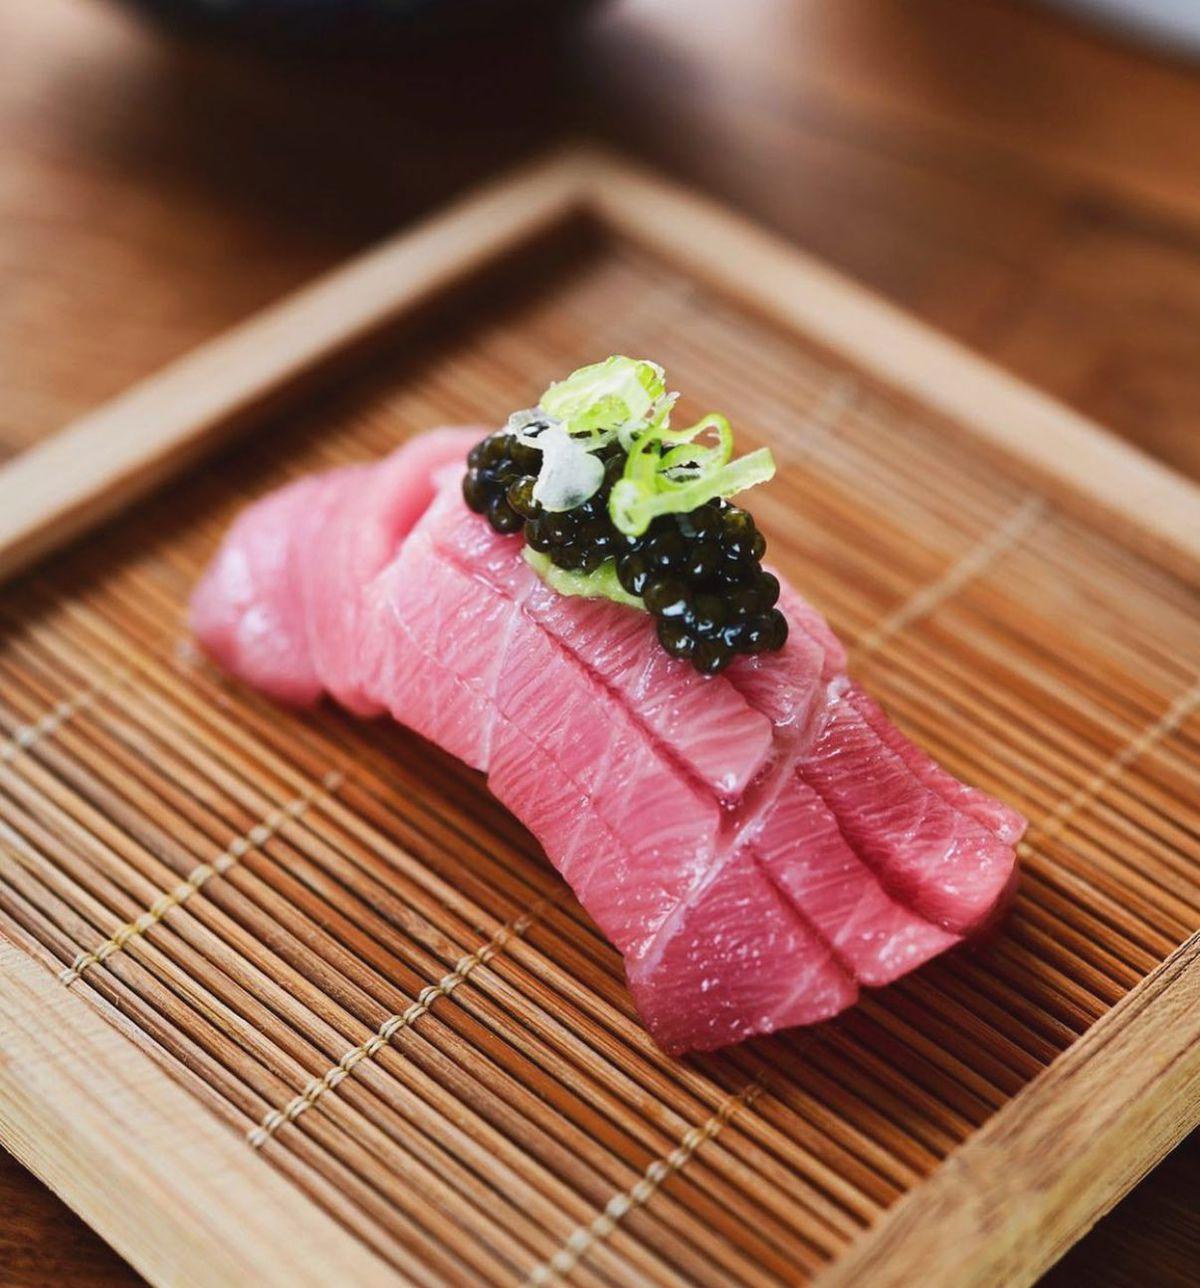 A sushi piece from Sushi Bar ATX